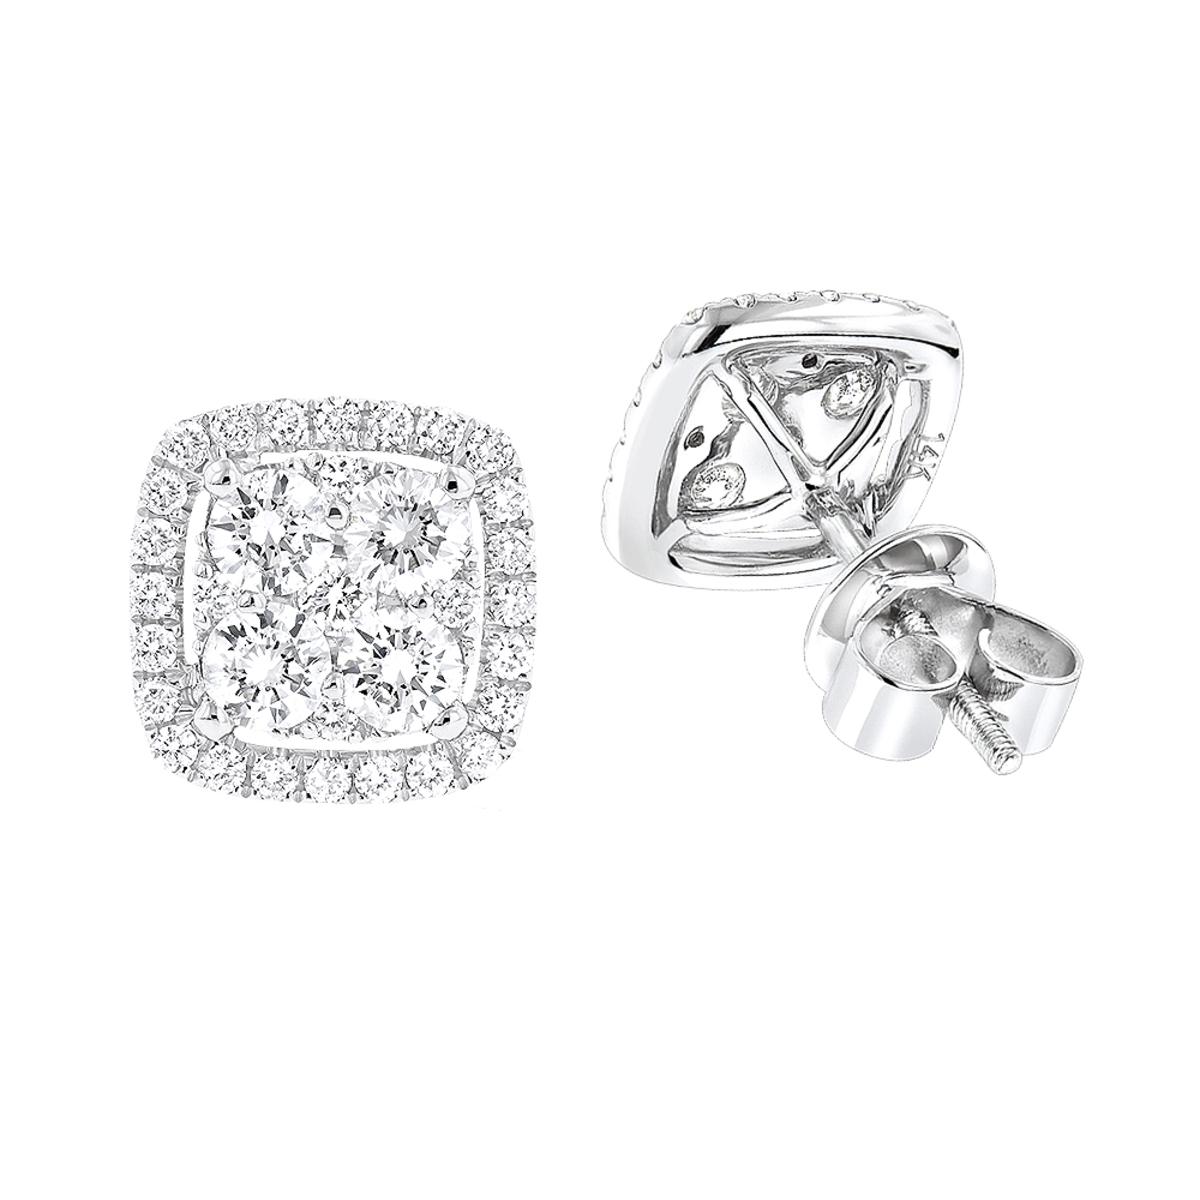 14K Gold Round Diamond Cluster Earrings Studs 1.5ct by Luxurman